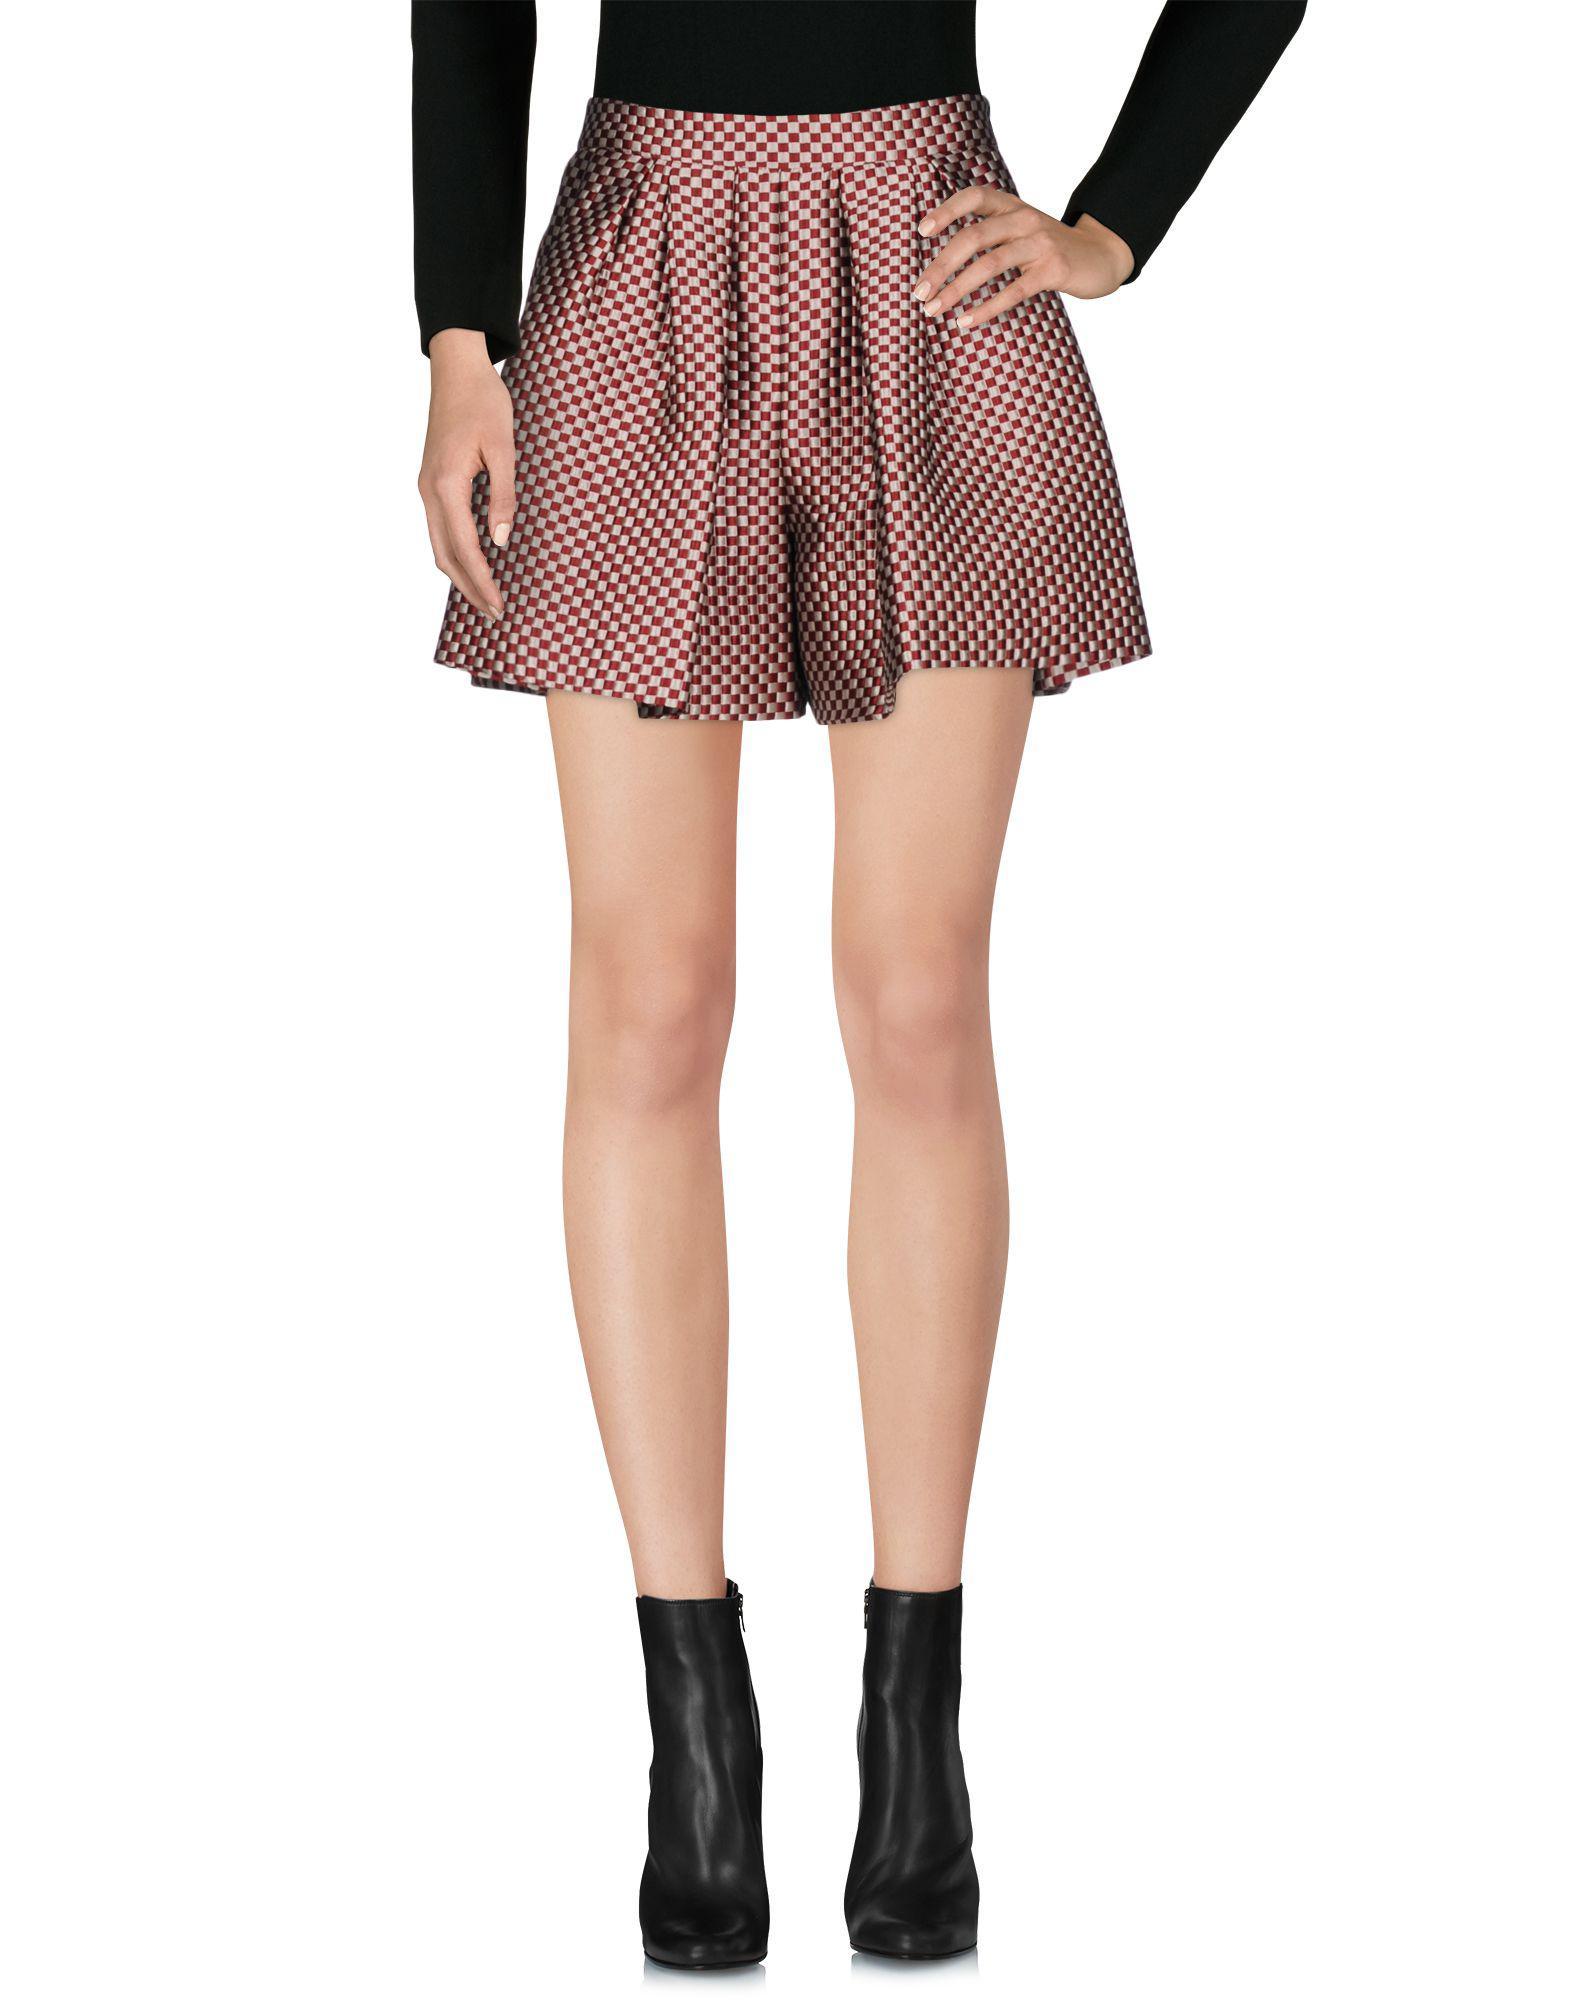 SKIRTS - Mini skirts Emporio Armani uRpZseAU